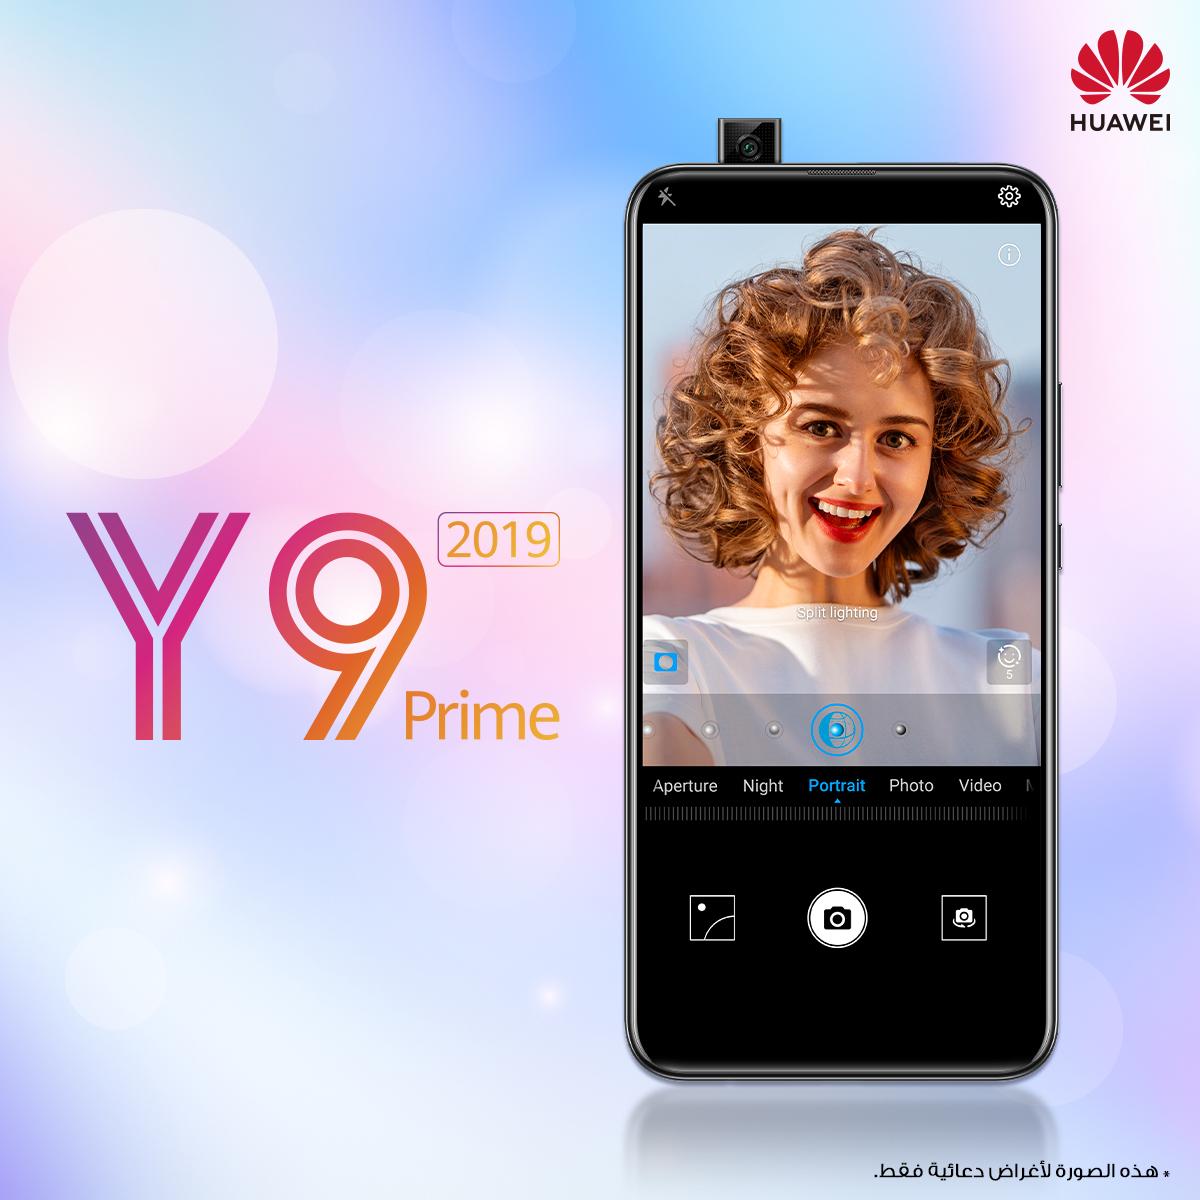 كل ما تريد معرفته حول Huawei Y9 Prime 2019